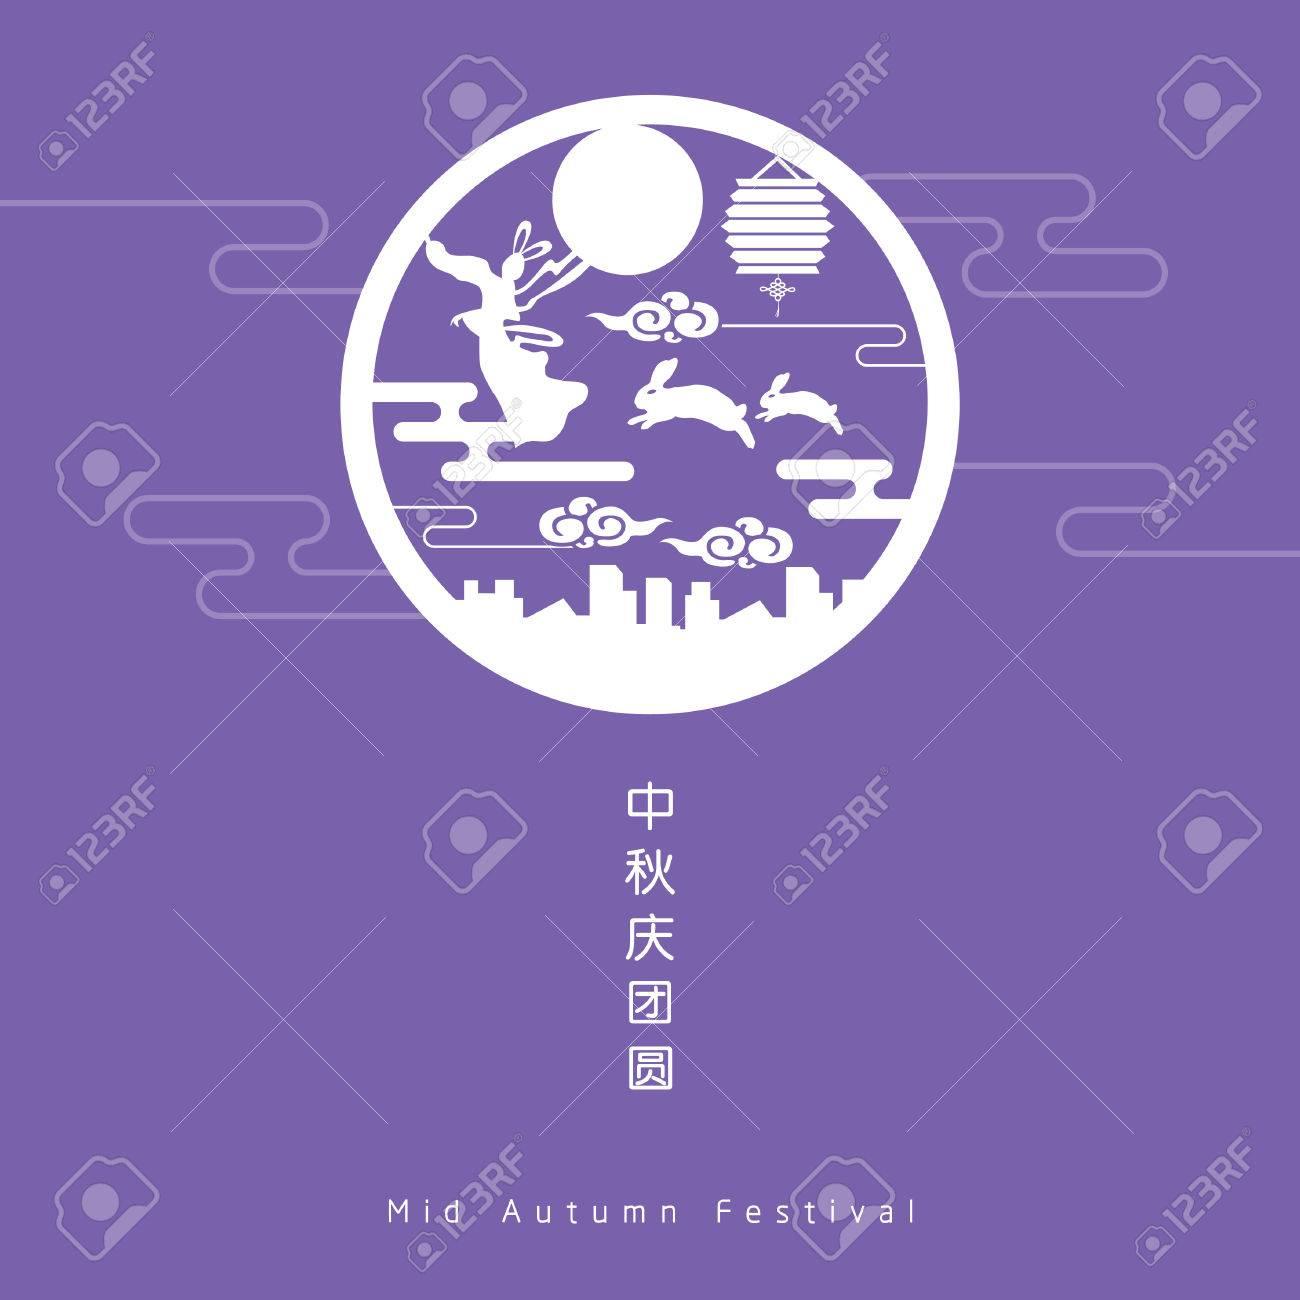 Mid-autumn festival illustration of Chang'e (moon goddess), bunny, lantern and full moon - 83435031